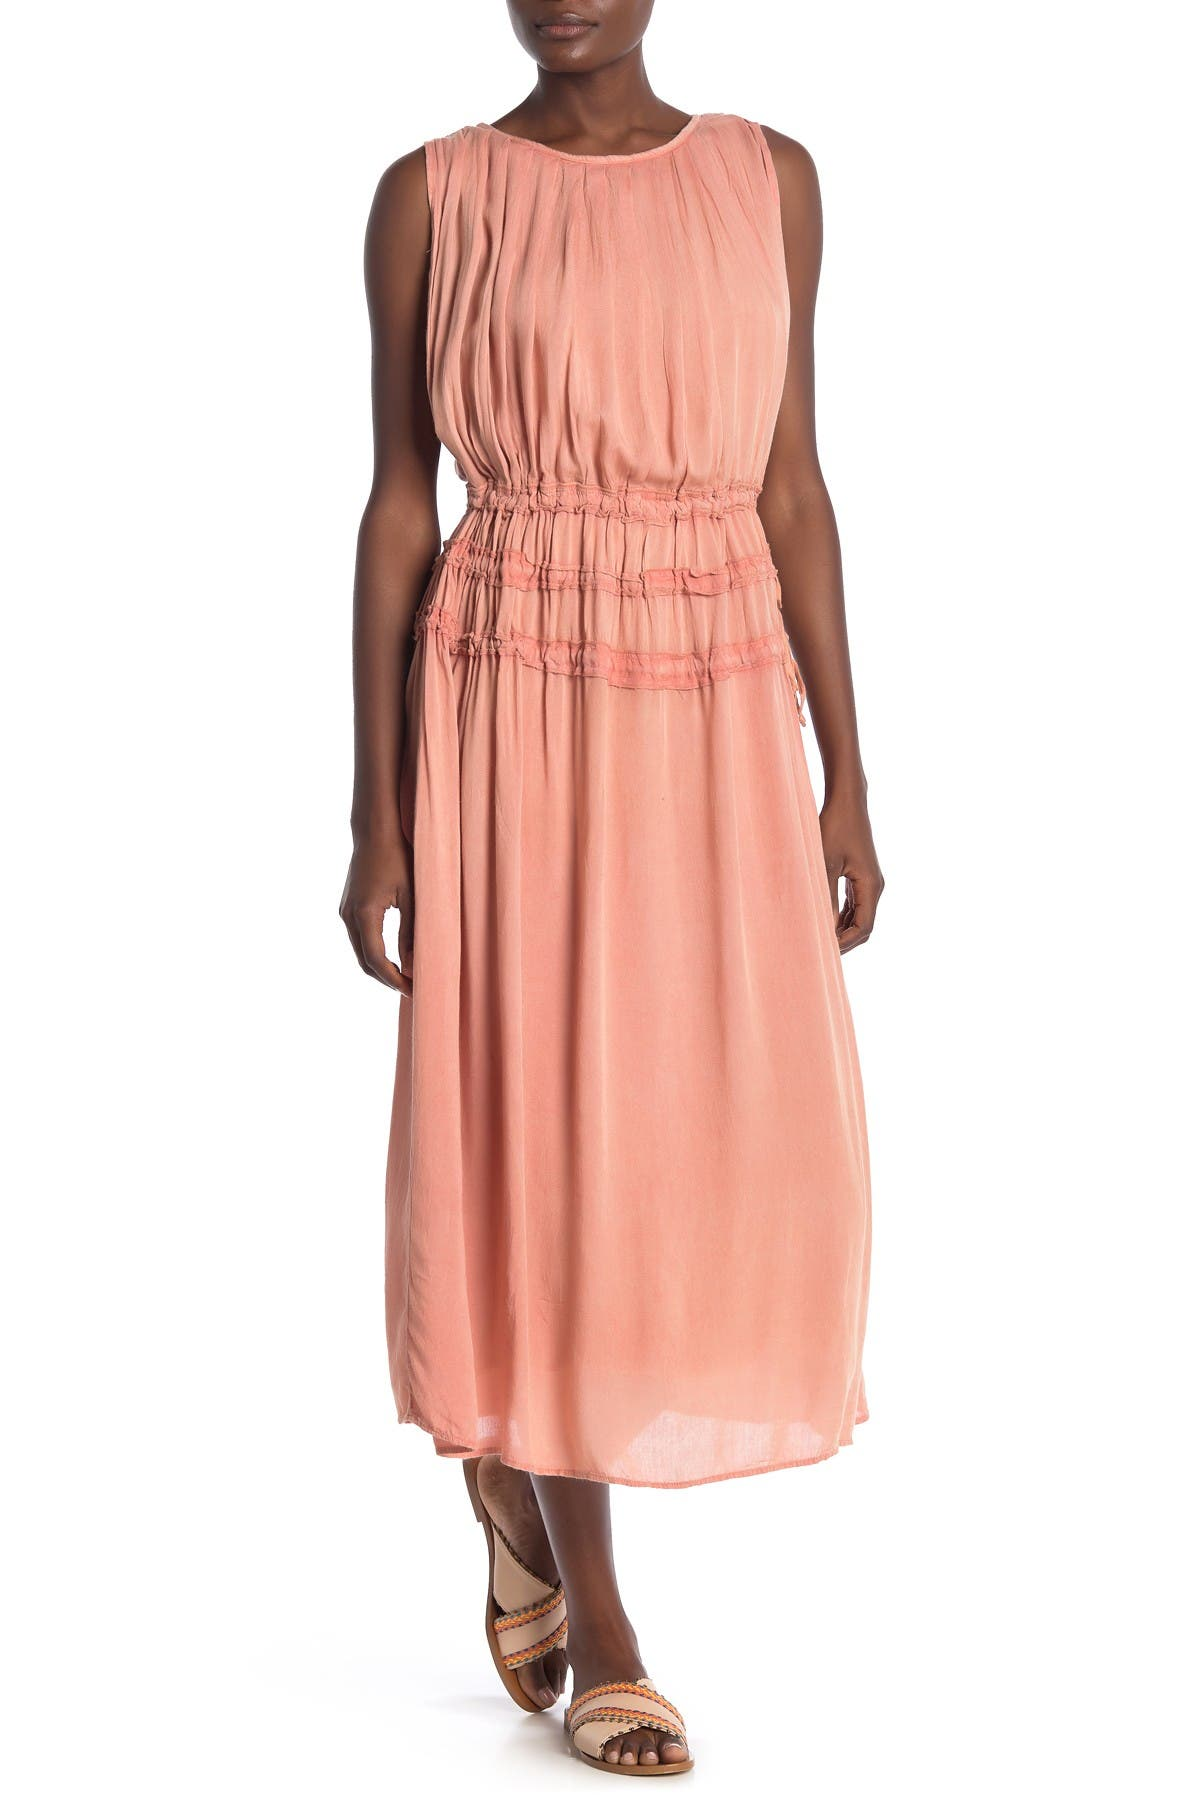 Image of BOHO ME Smocked Waist Cover-Up Midi Dress